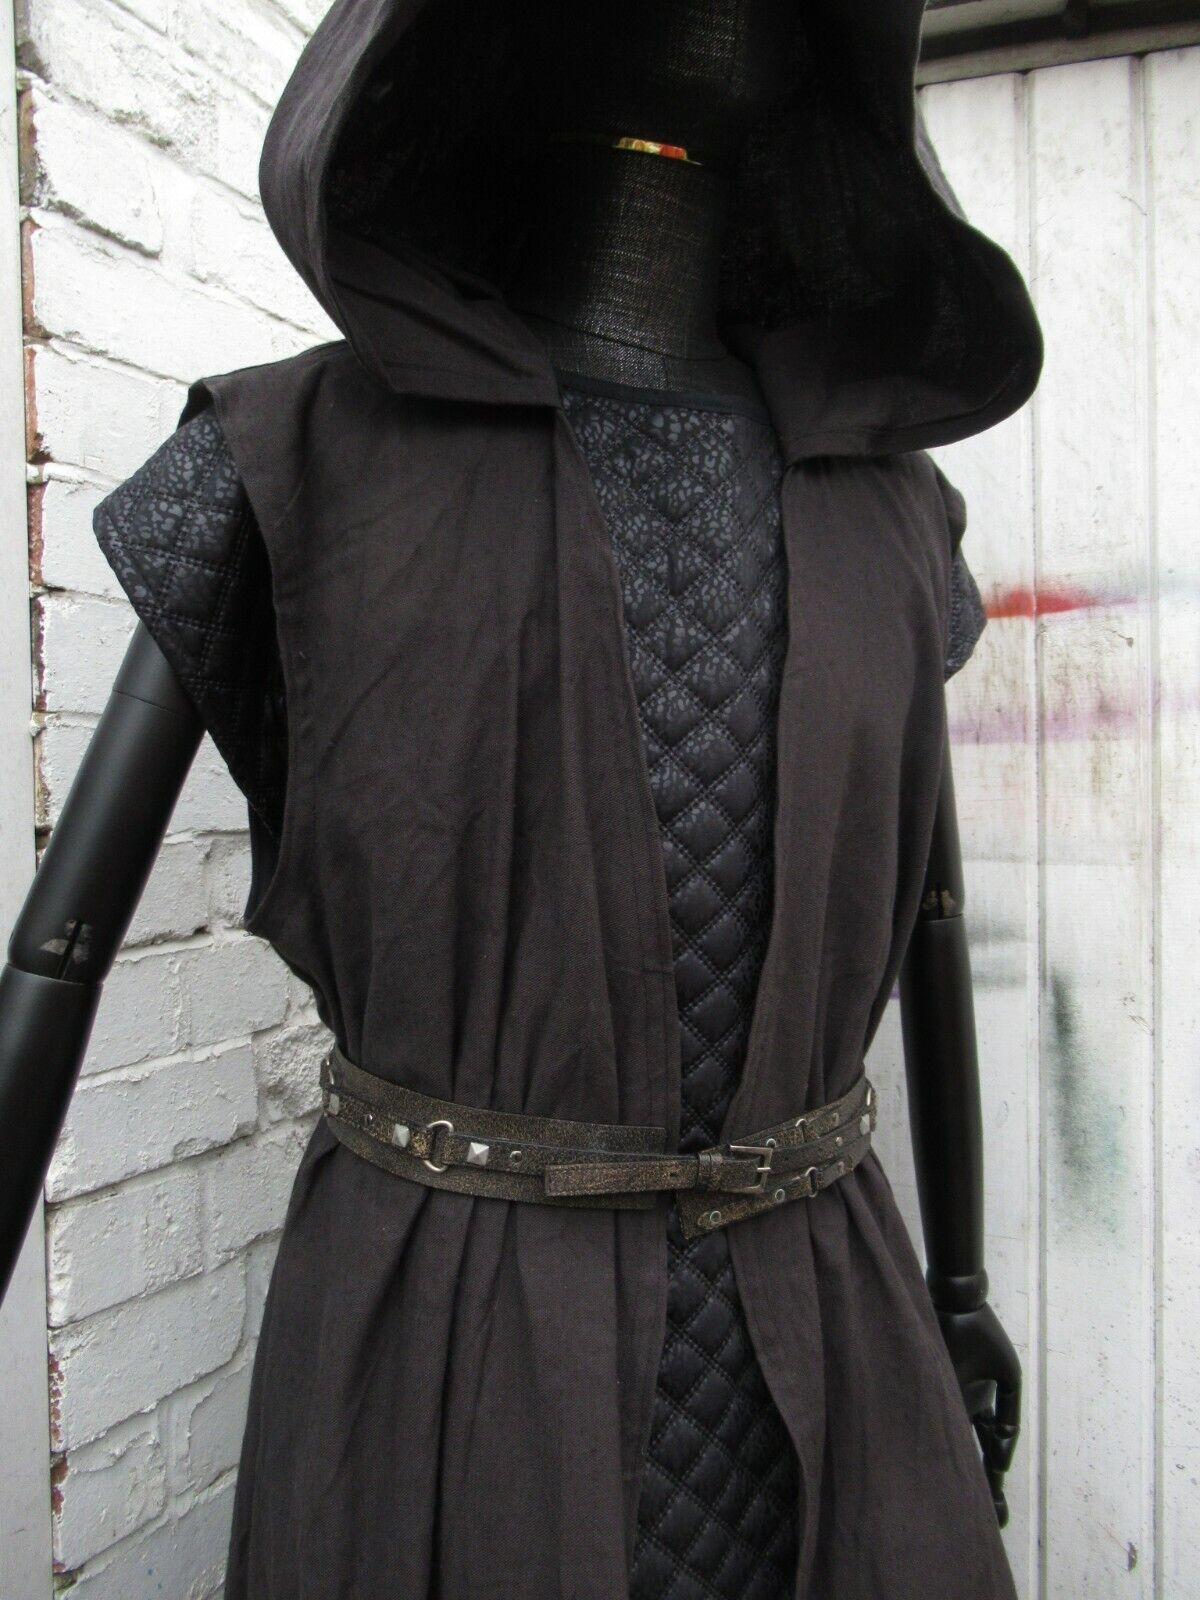 Medieval tunic surcoat Re enactment LOTR Vikings hooded tunic coat